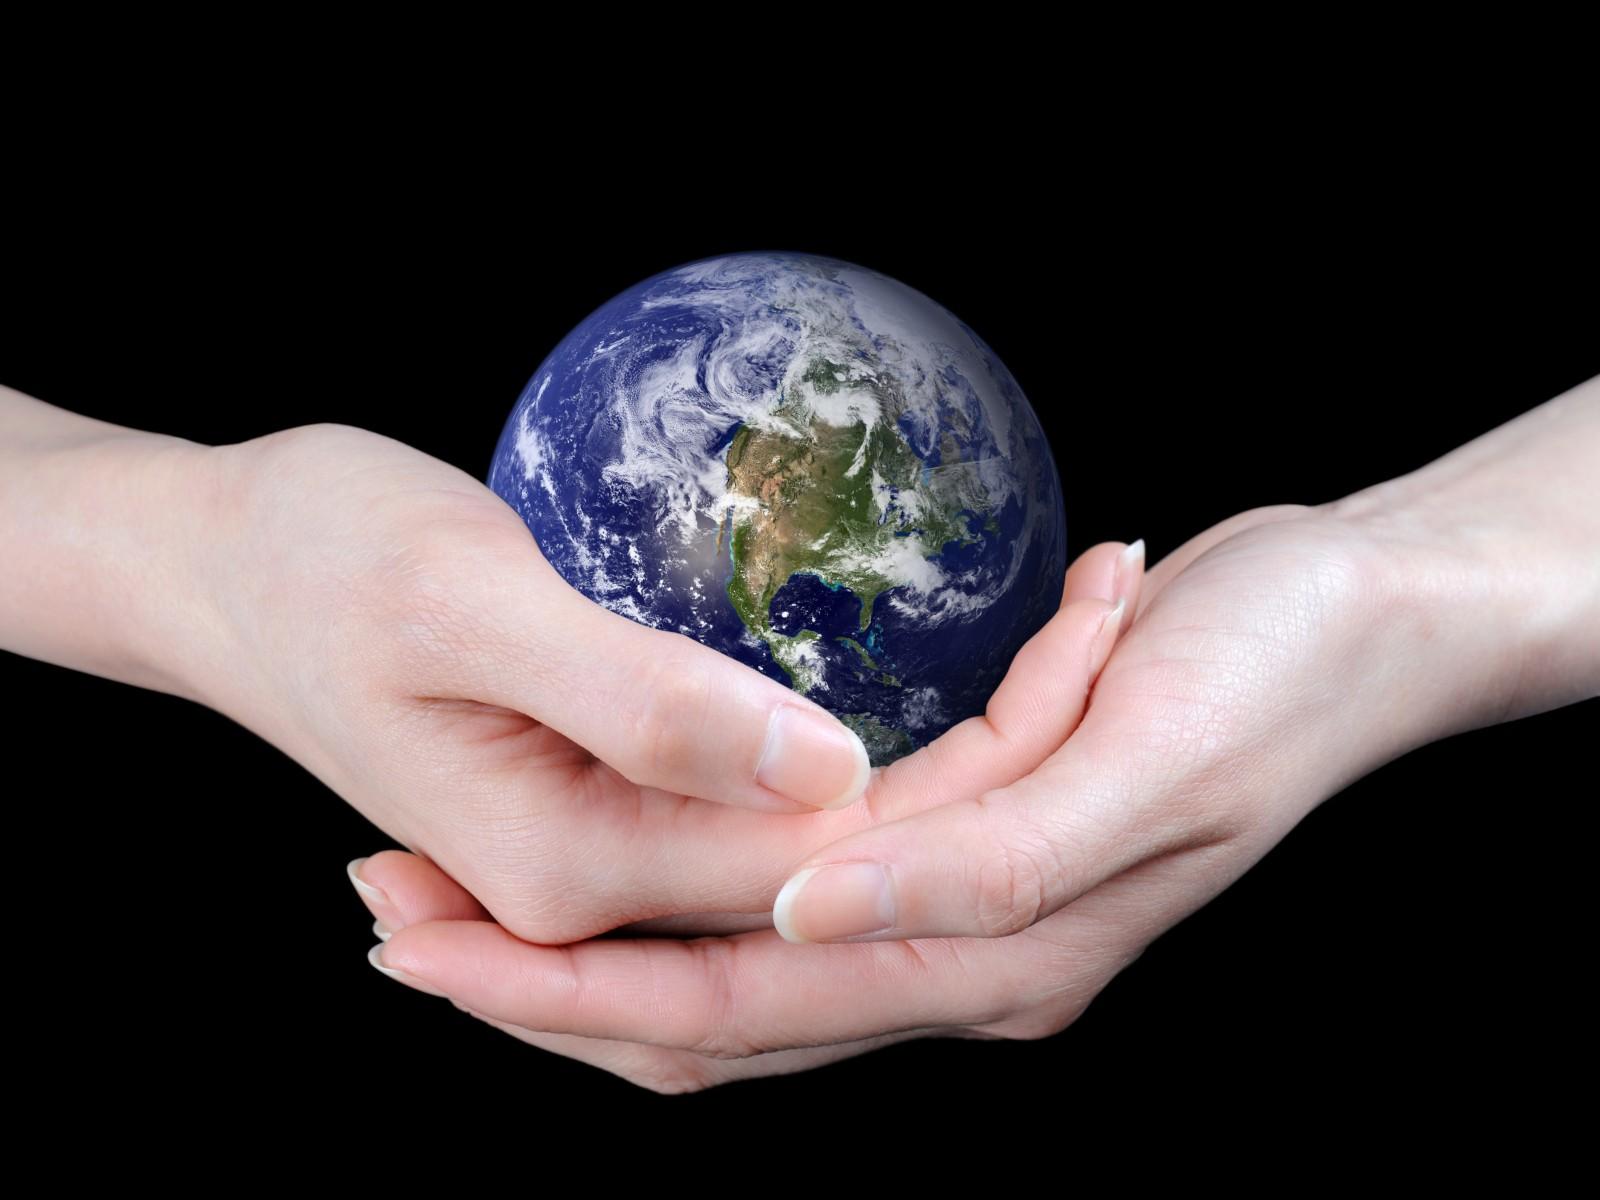 Global Healthcare Expert to Lead Cedars-Sinai International Health